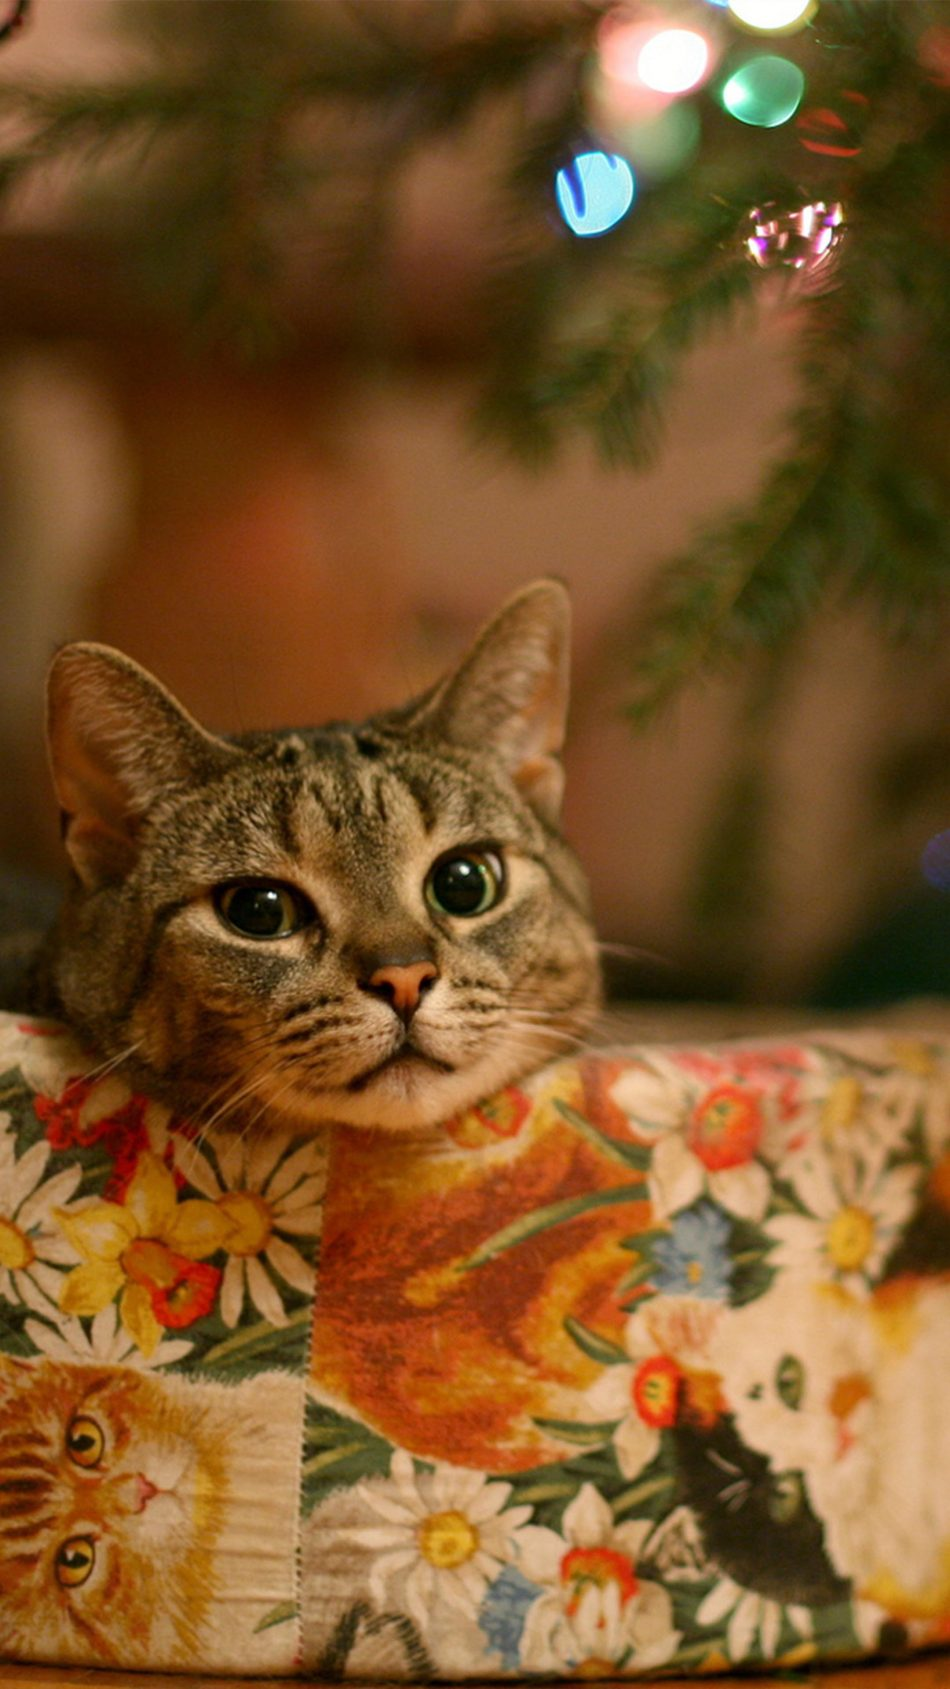 Cat Christmas Eve Celebration 4K Ultra HD Mobile Wallpaper